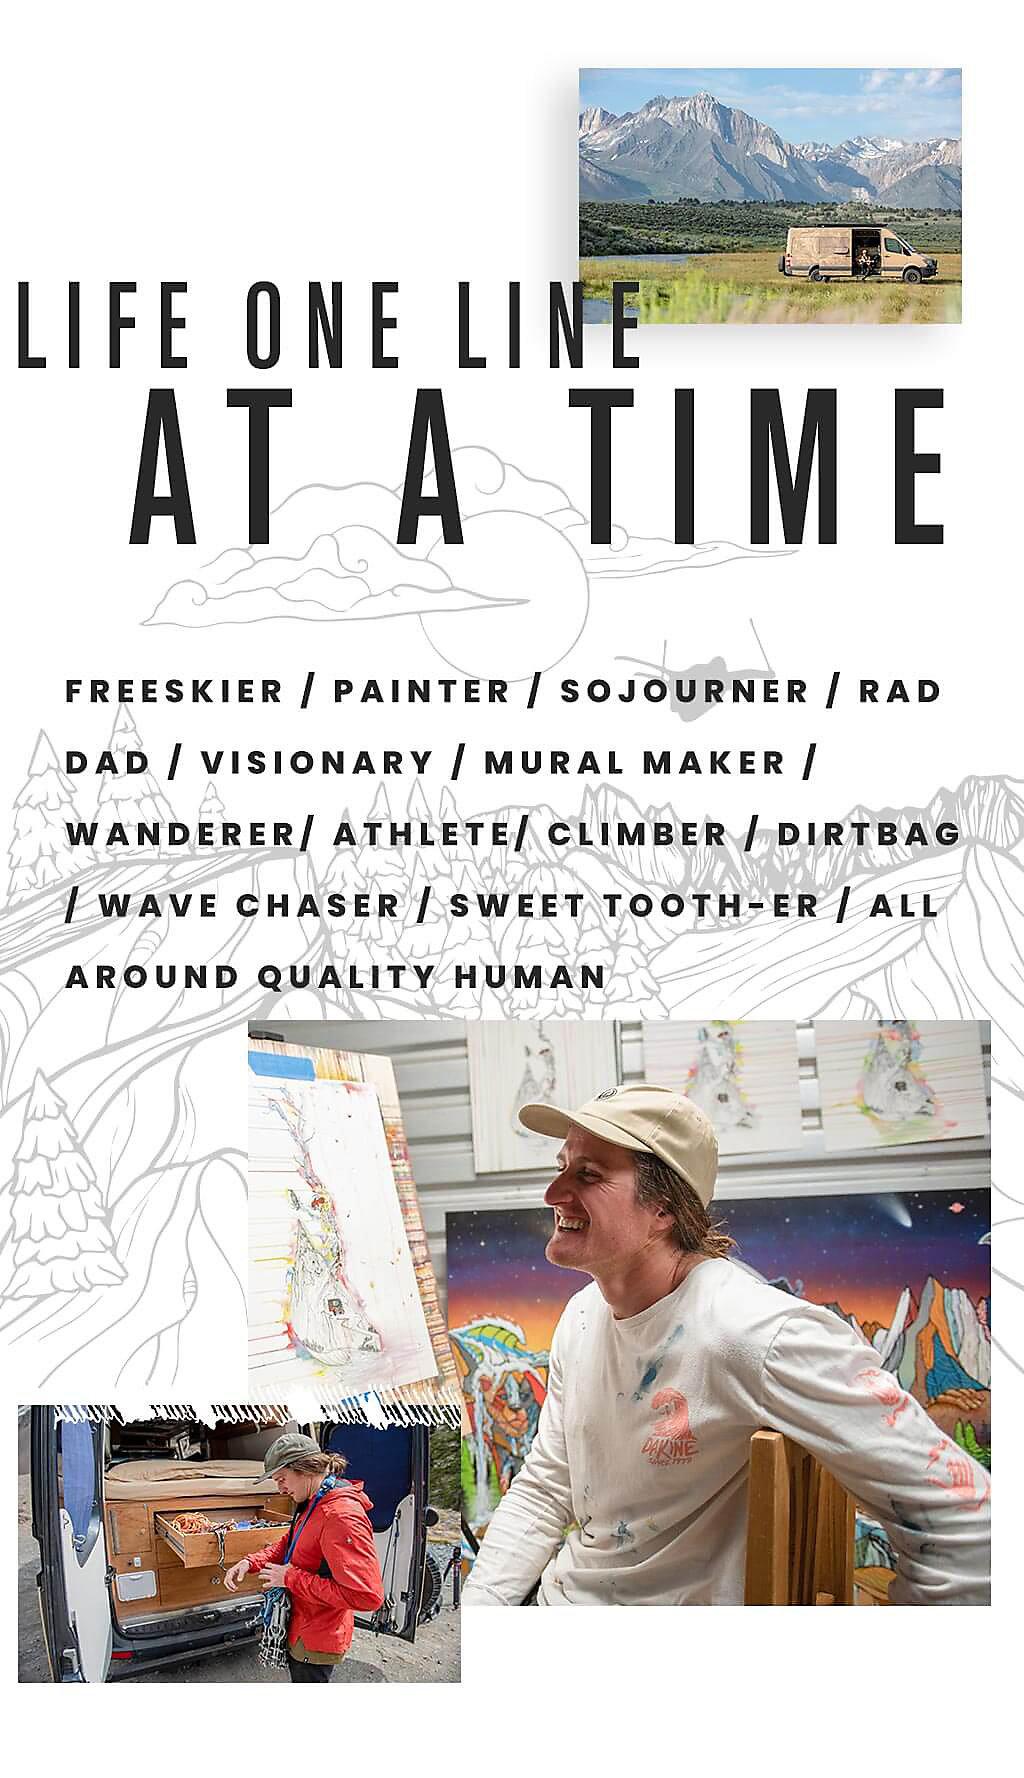 Chris Benchetler collage